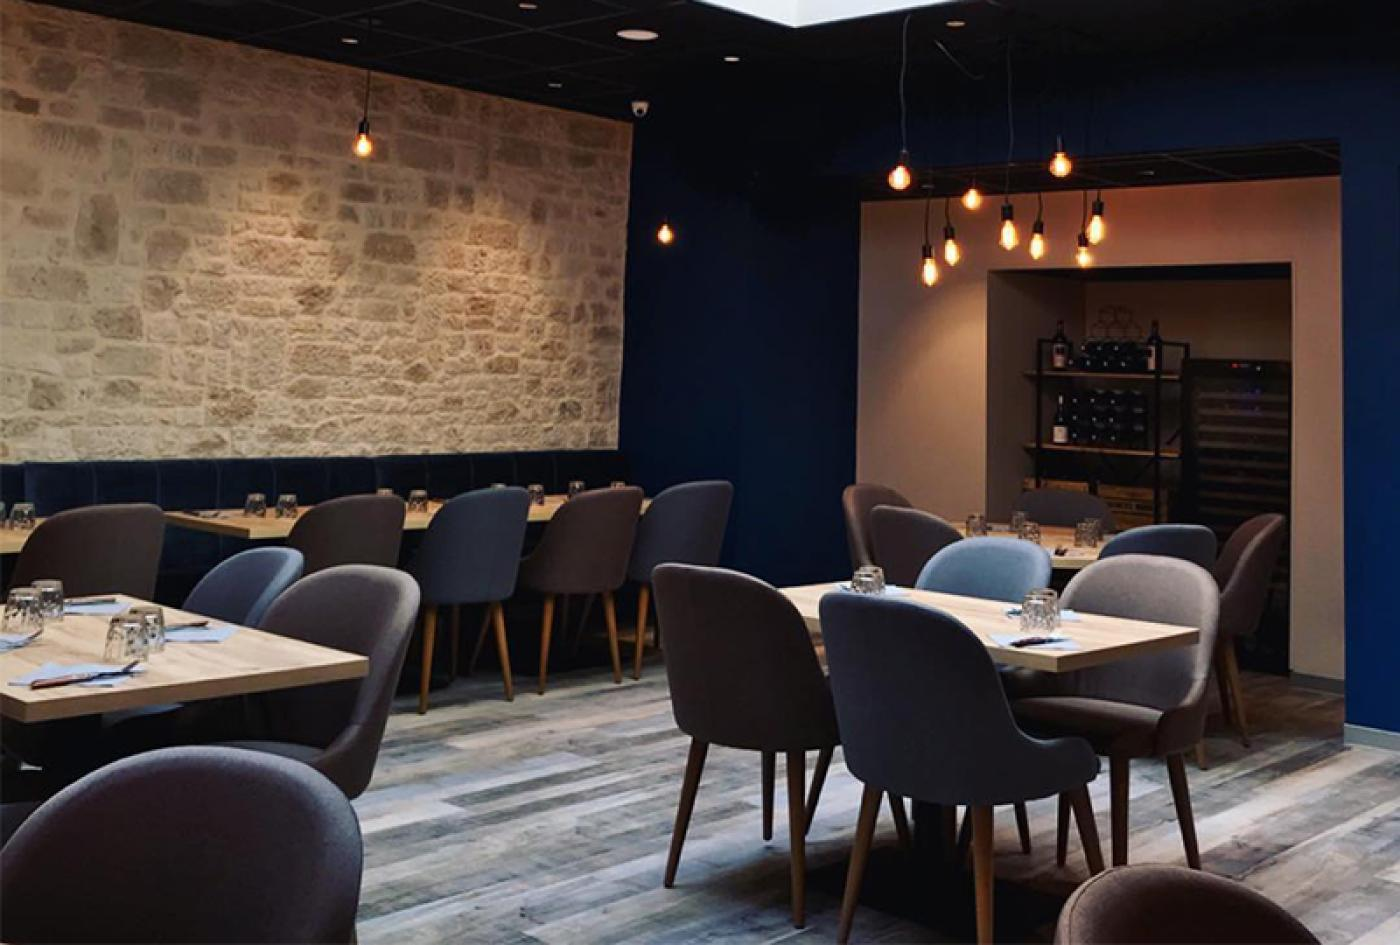 rénovation restaurant caen